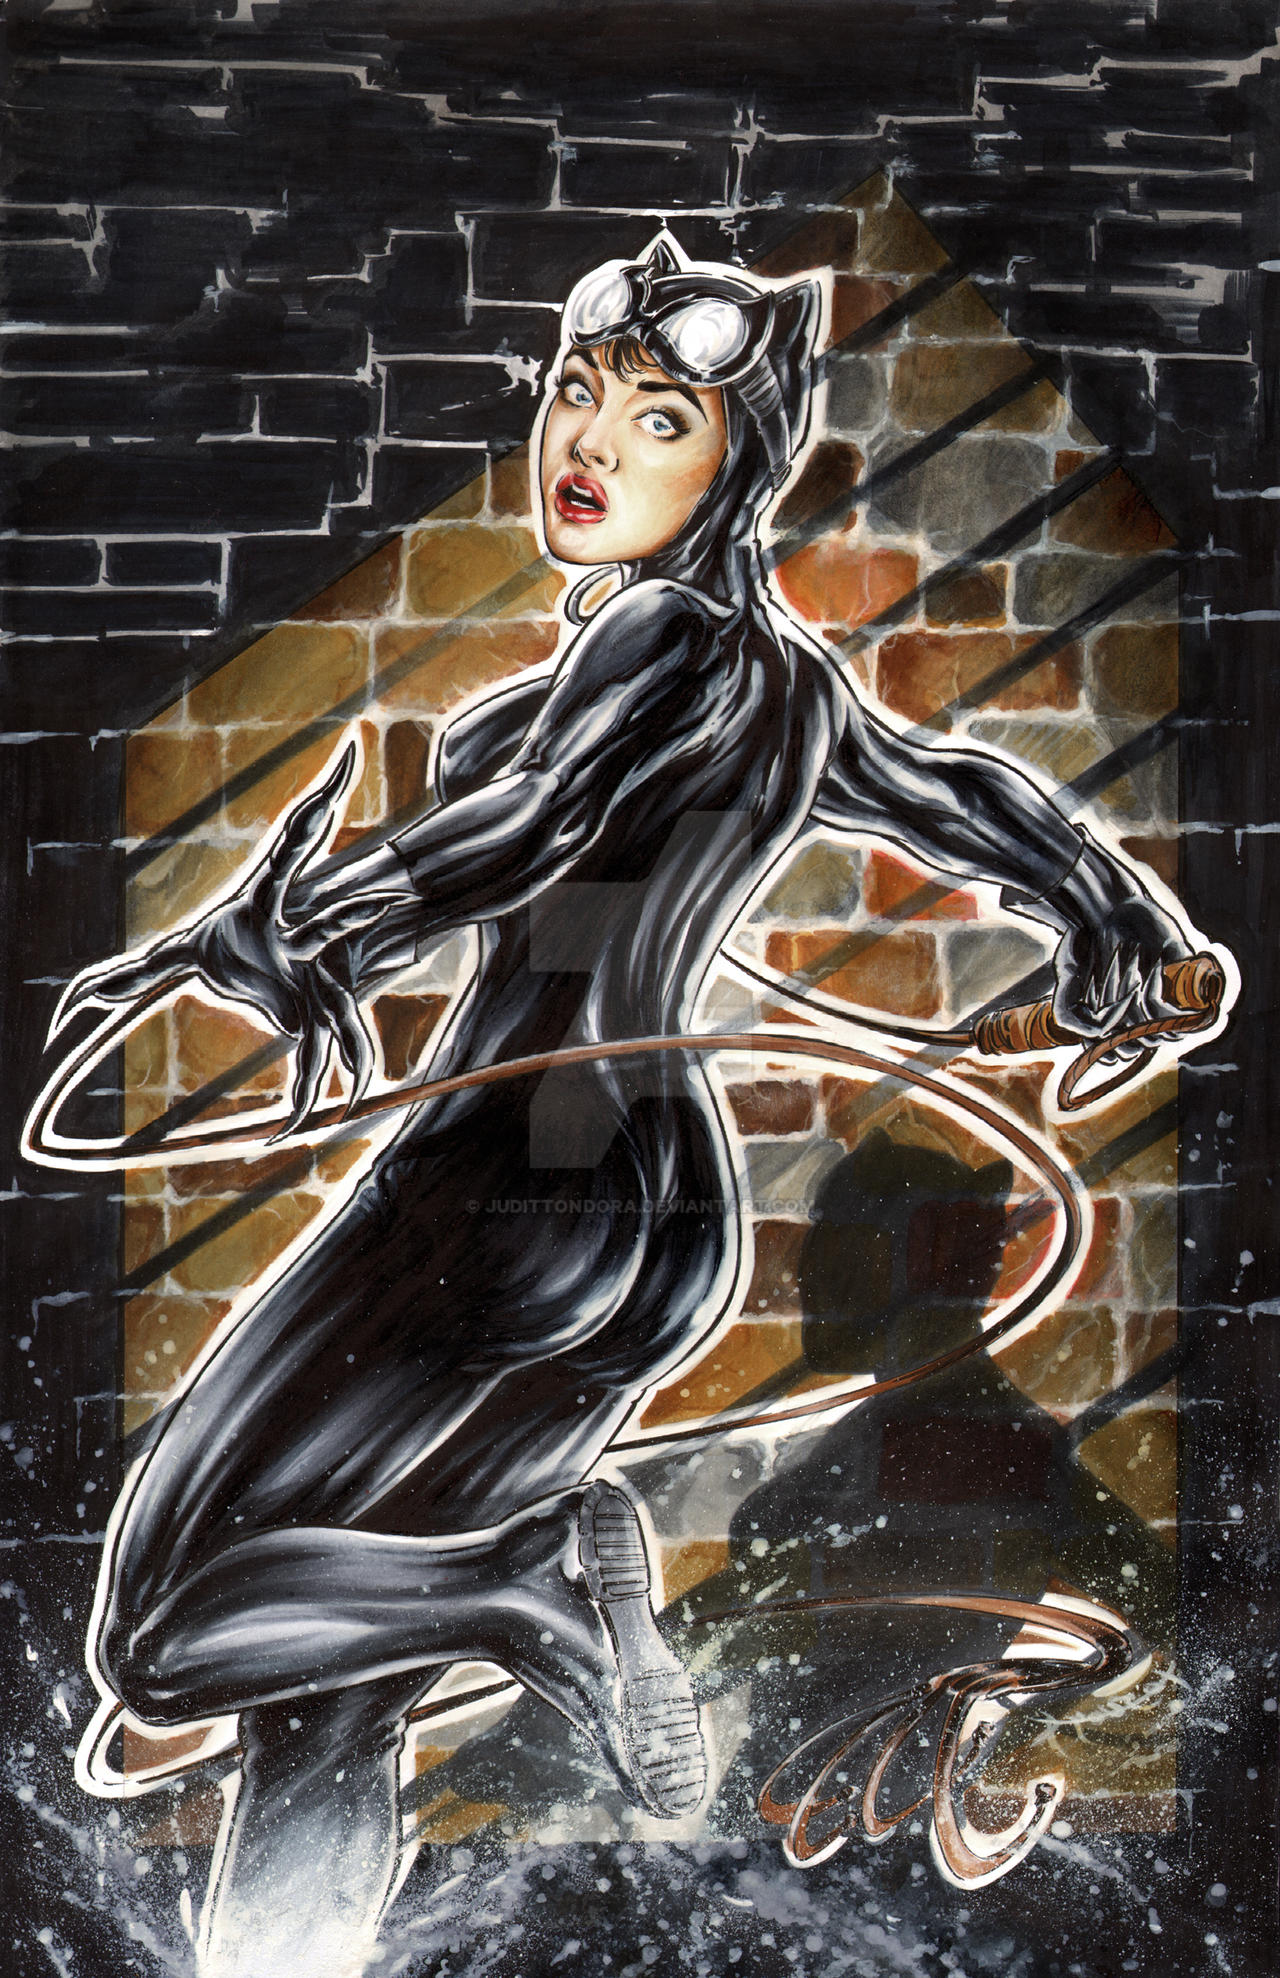 Catwoman by judittondora